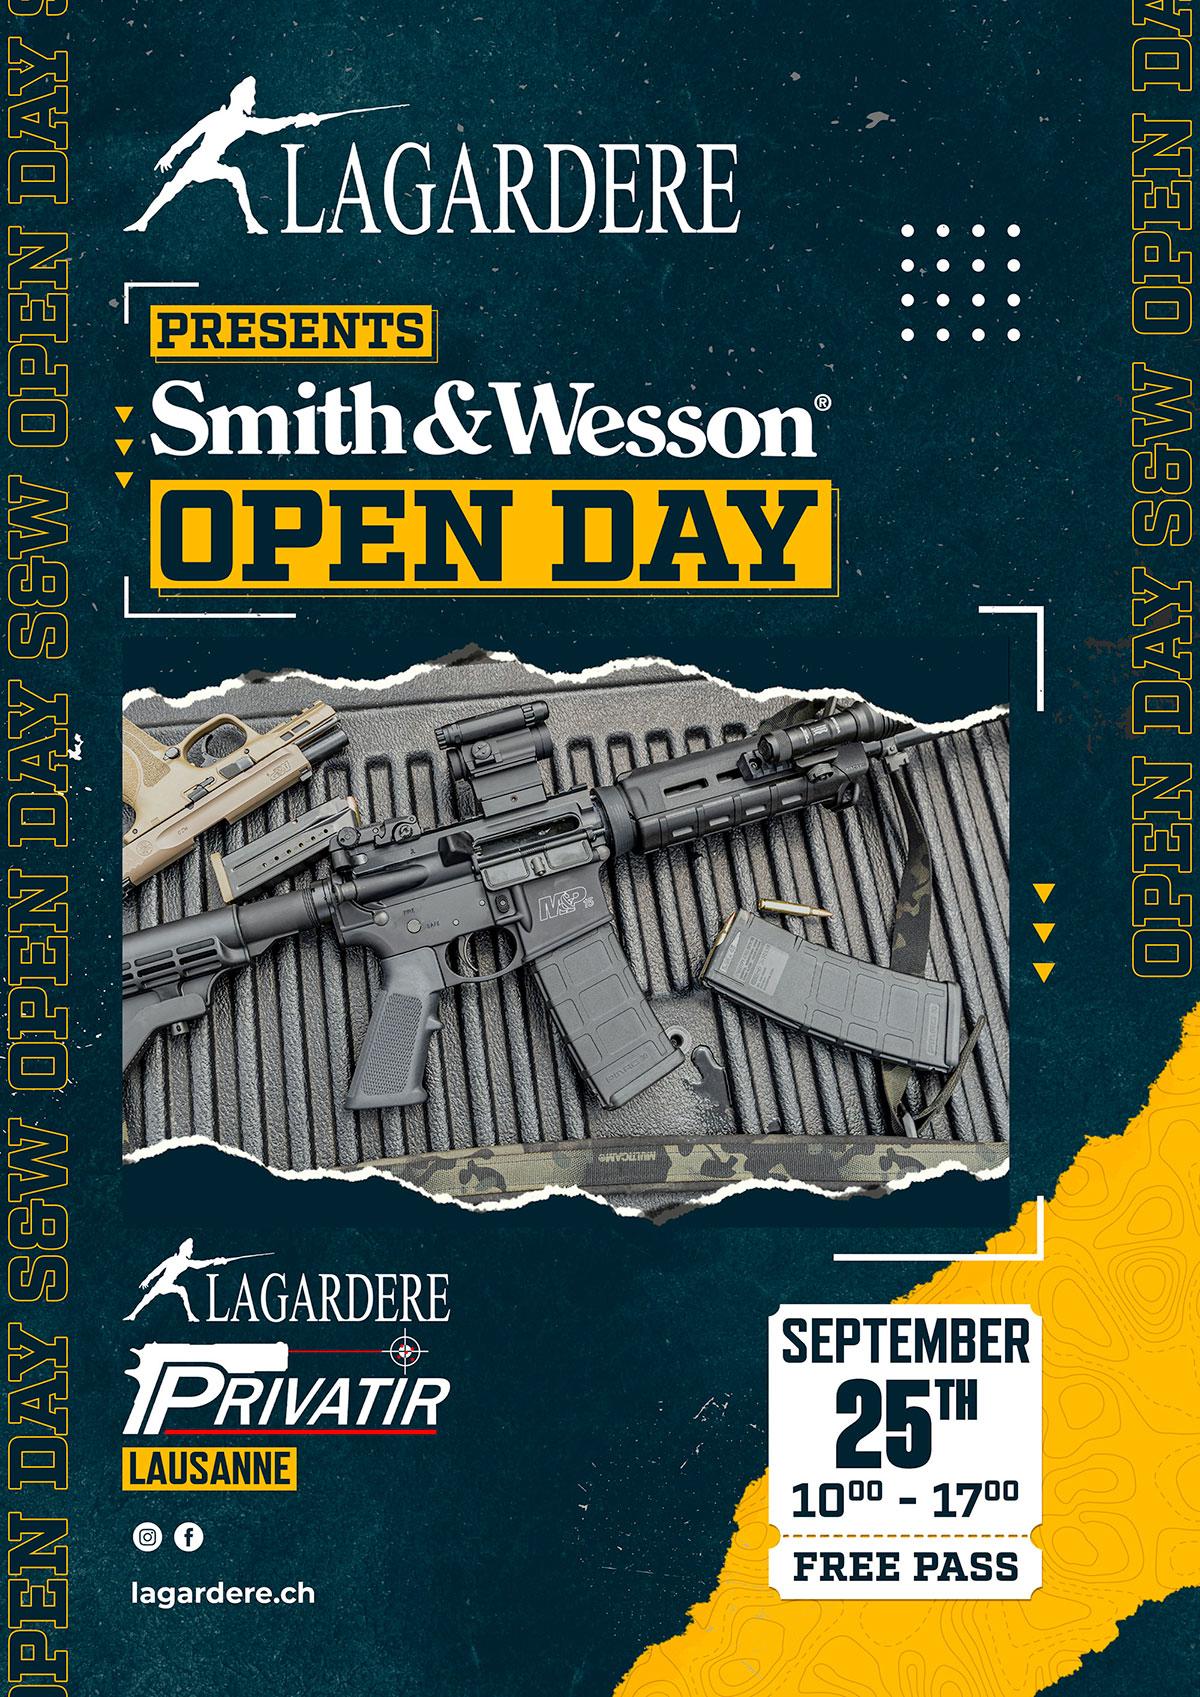 Lagardere S&W Open Day